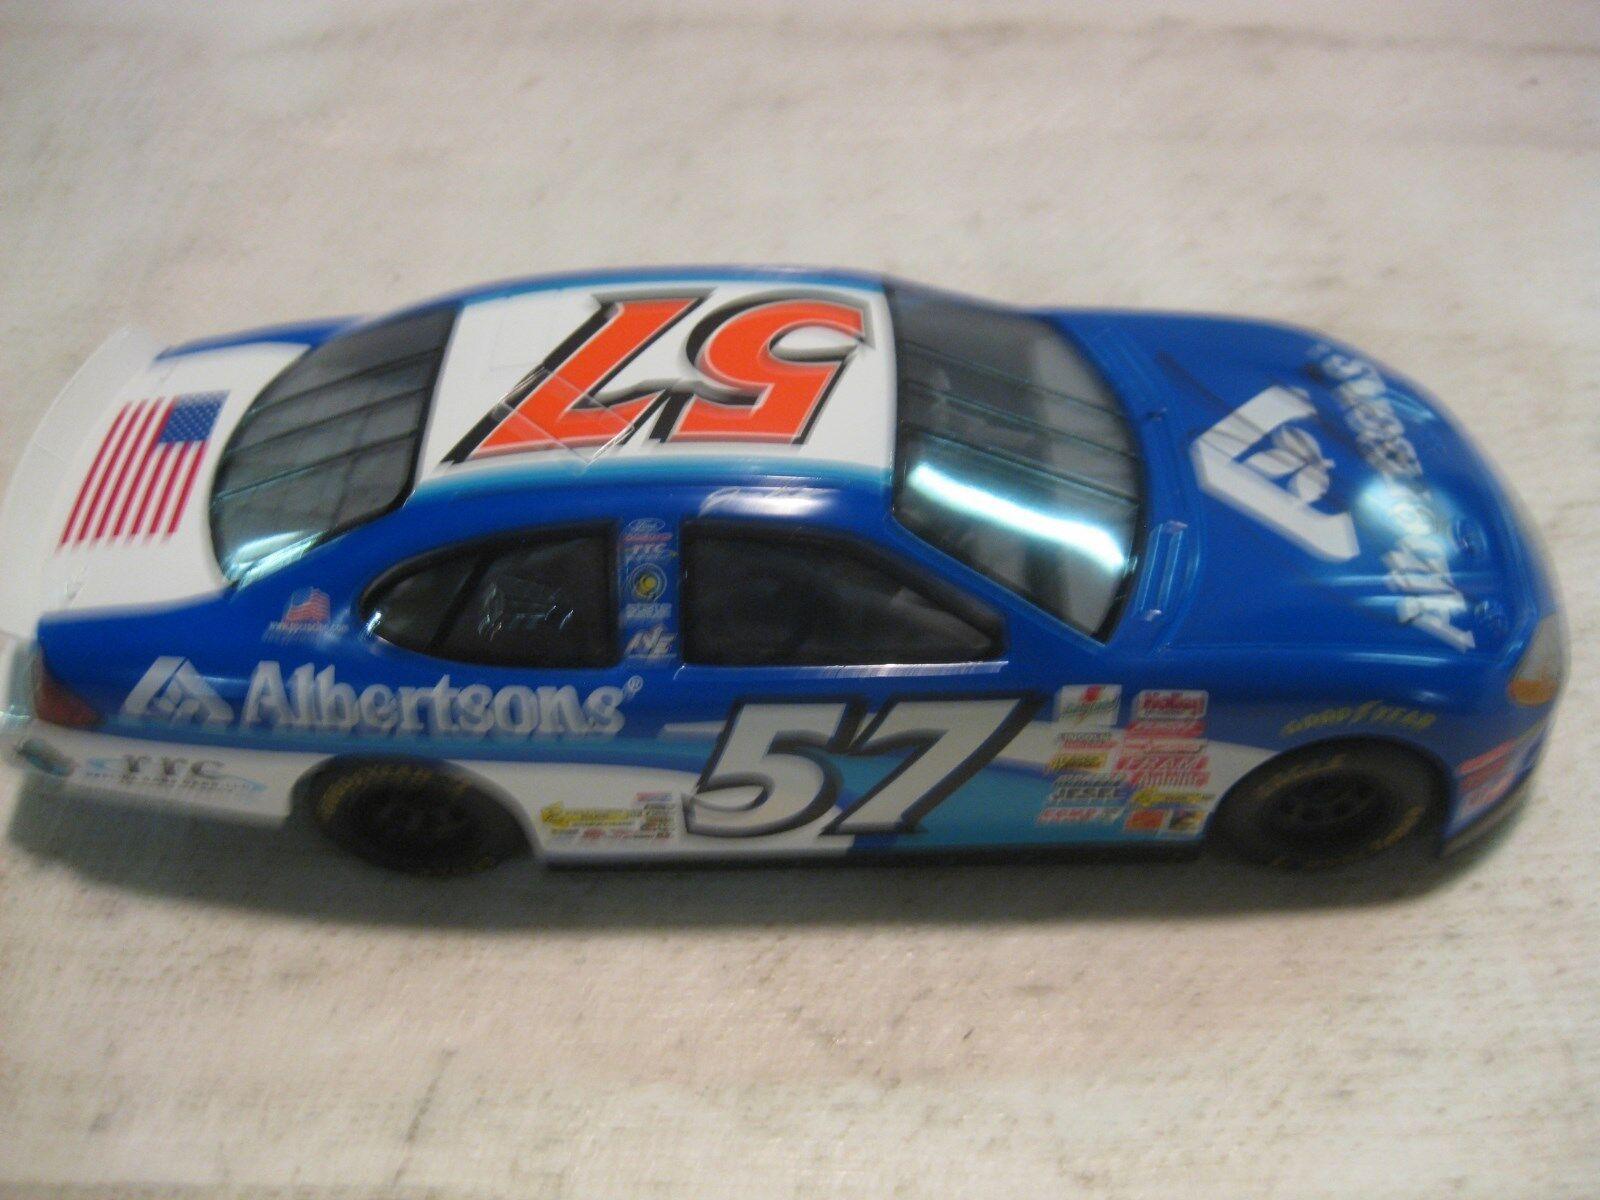 Nascar Jason Keller Albertsons Ford Taurus 124 Scale Diecast RC 2000 dc630